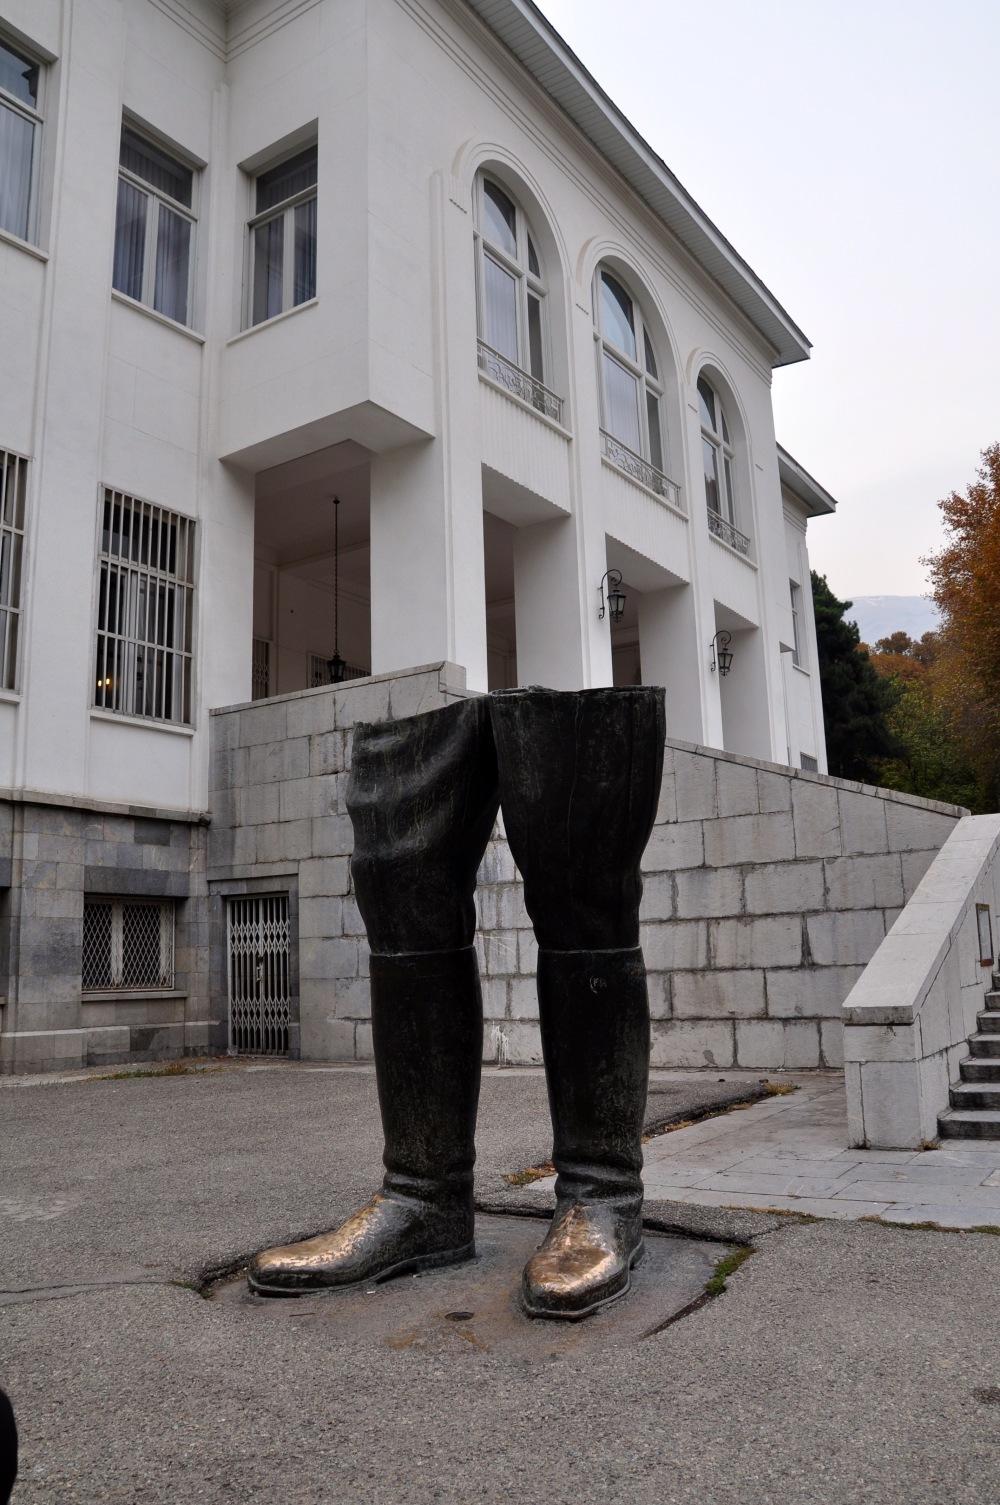 reza-pahlavi-statue-legs-sadabad-palace-tehran-iran